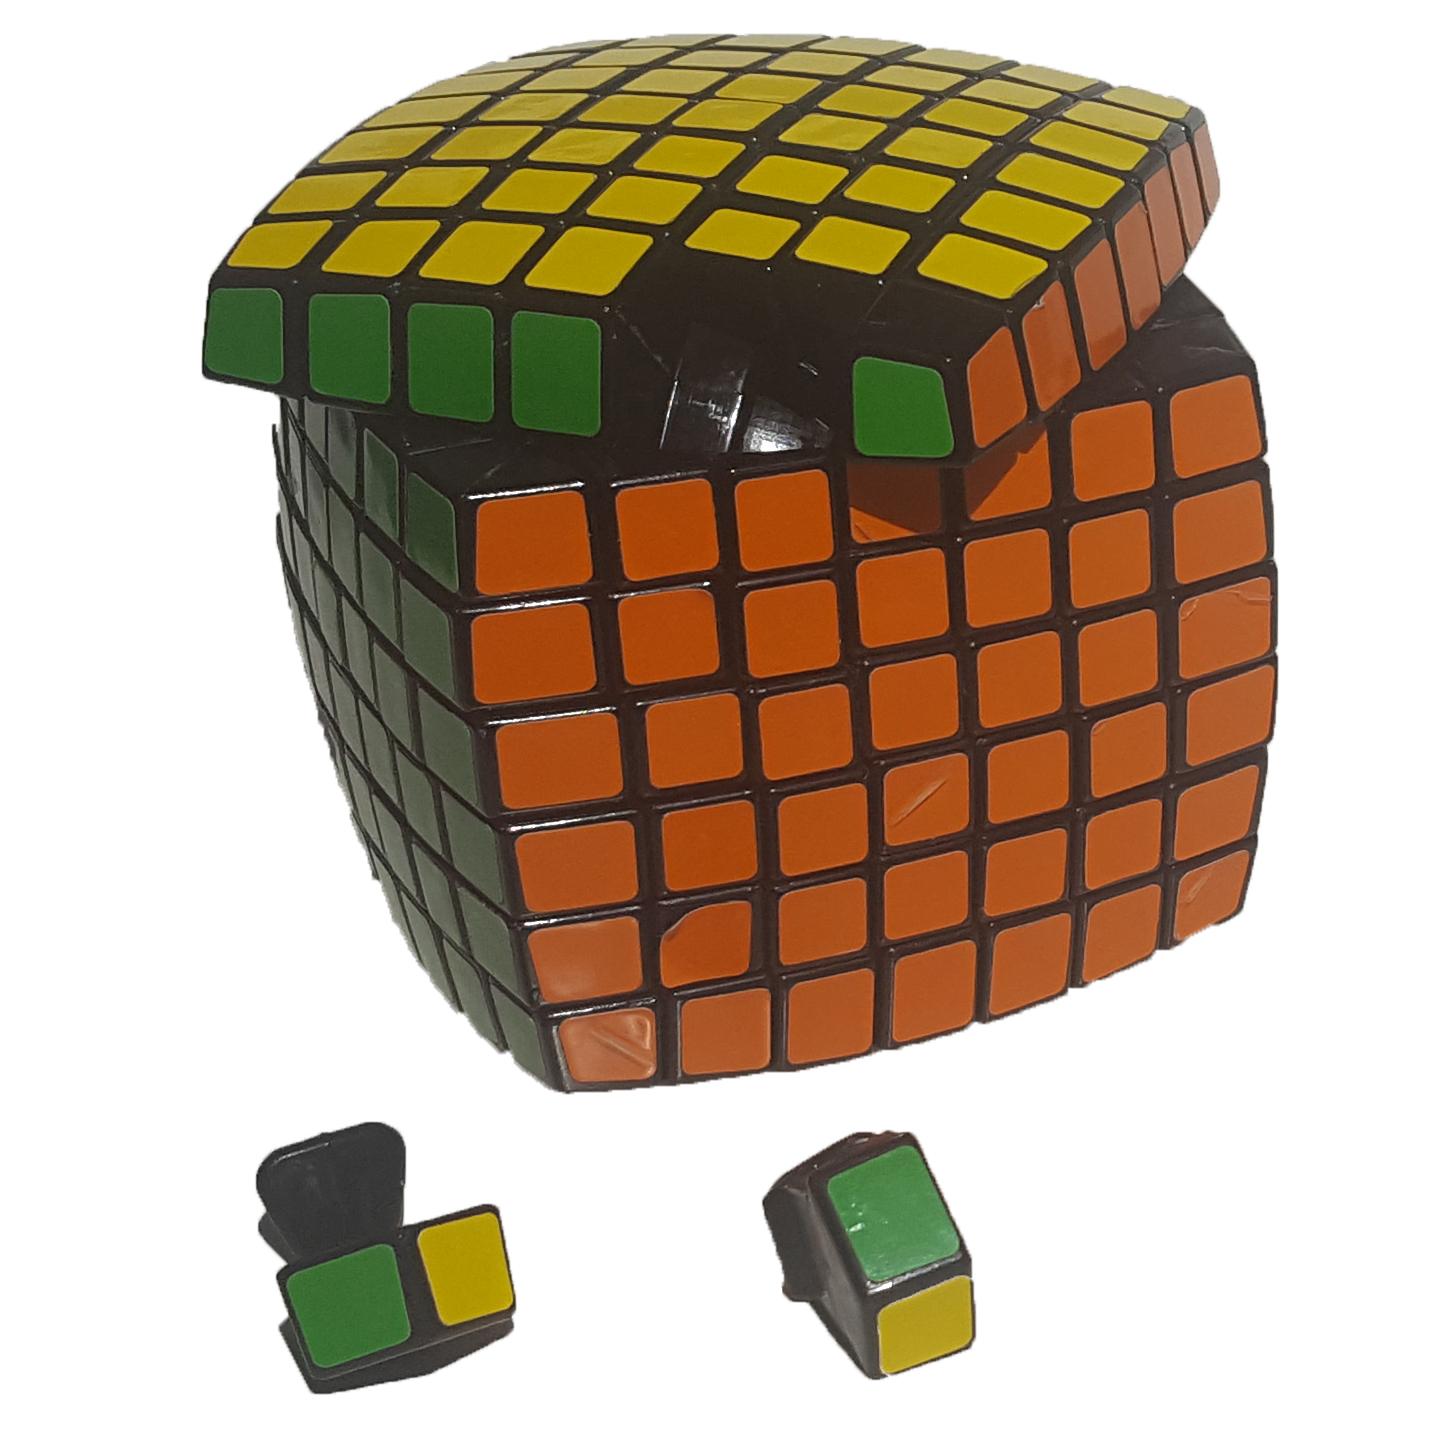 verdes 7x7 rubik's cube popping